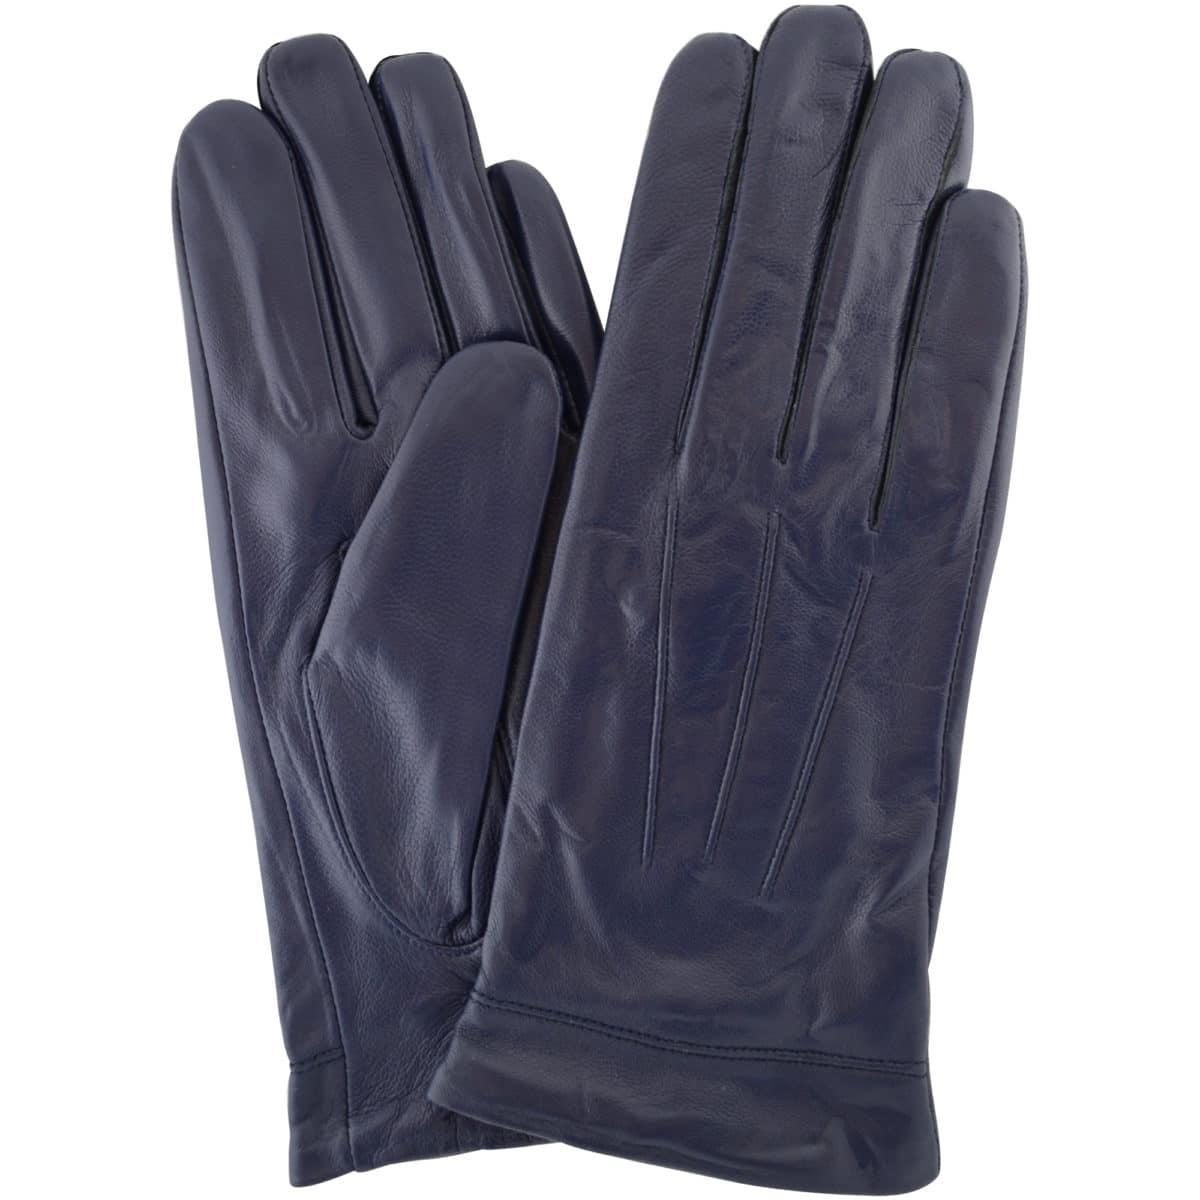 Mavis - Leather Gloves Three Point Stitch - Navy